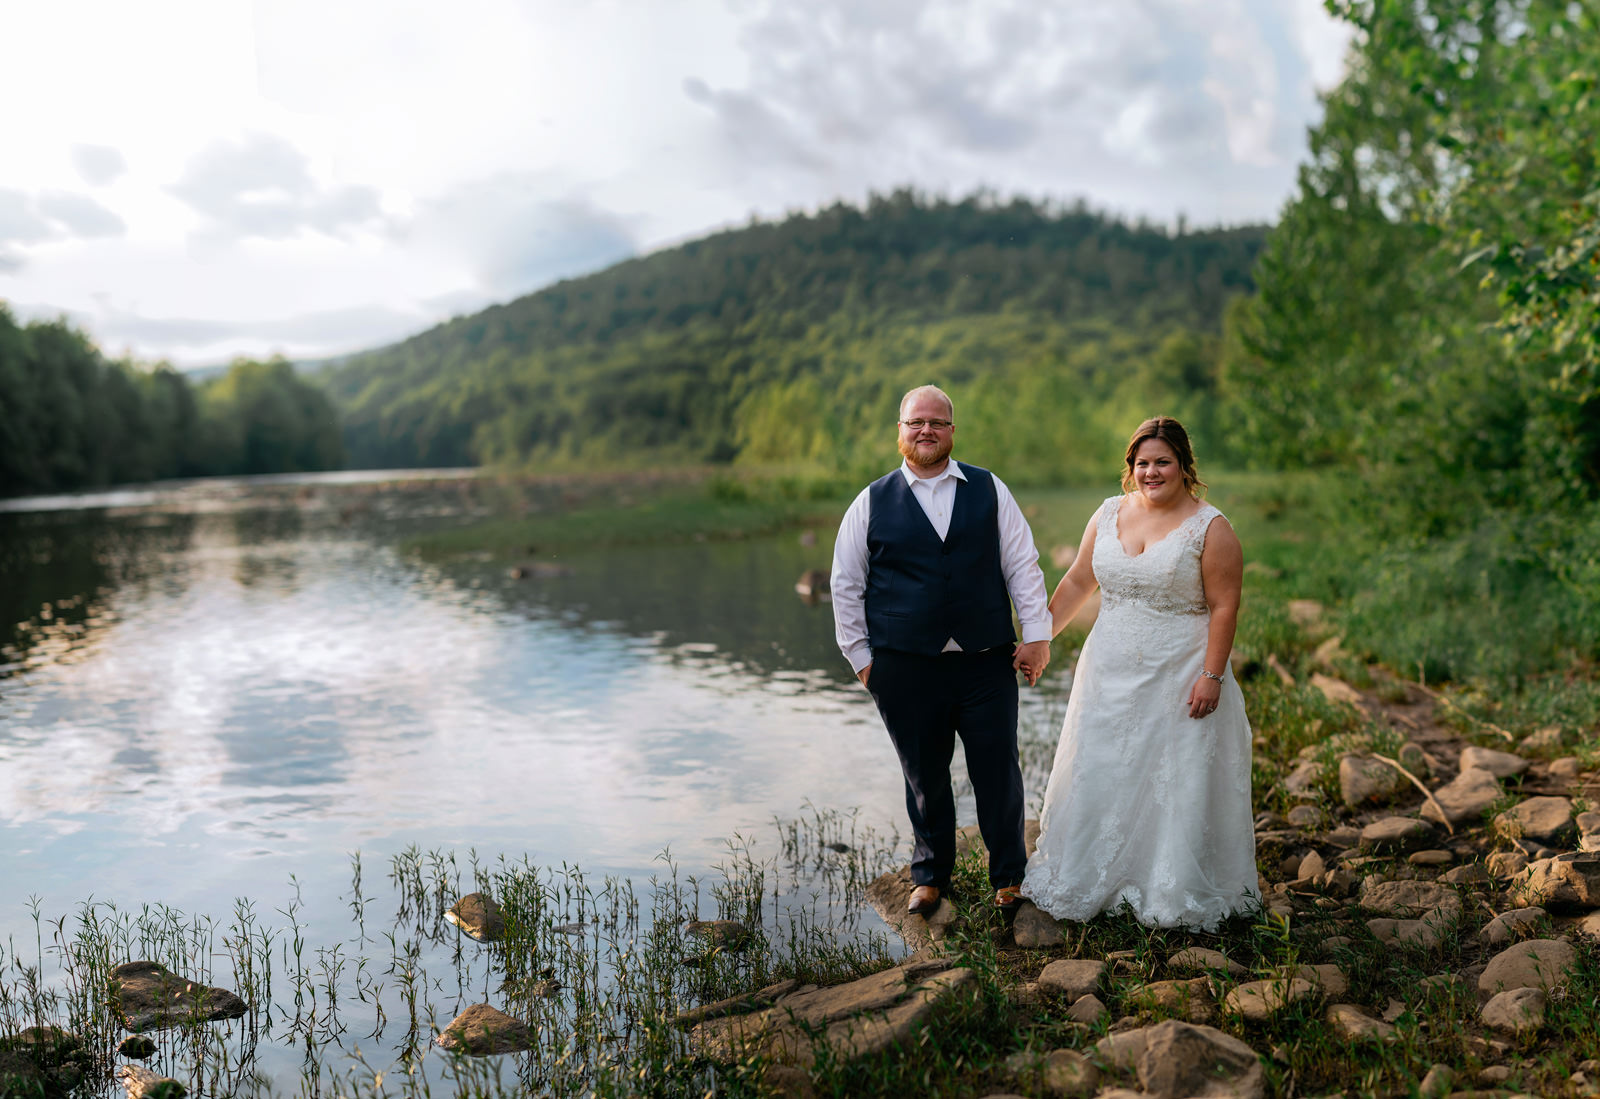 brenizer method cheat river wedding